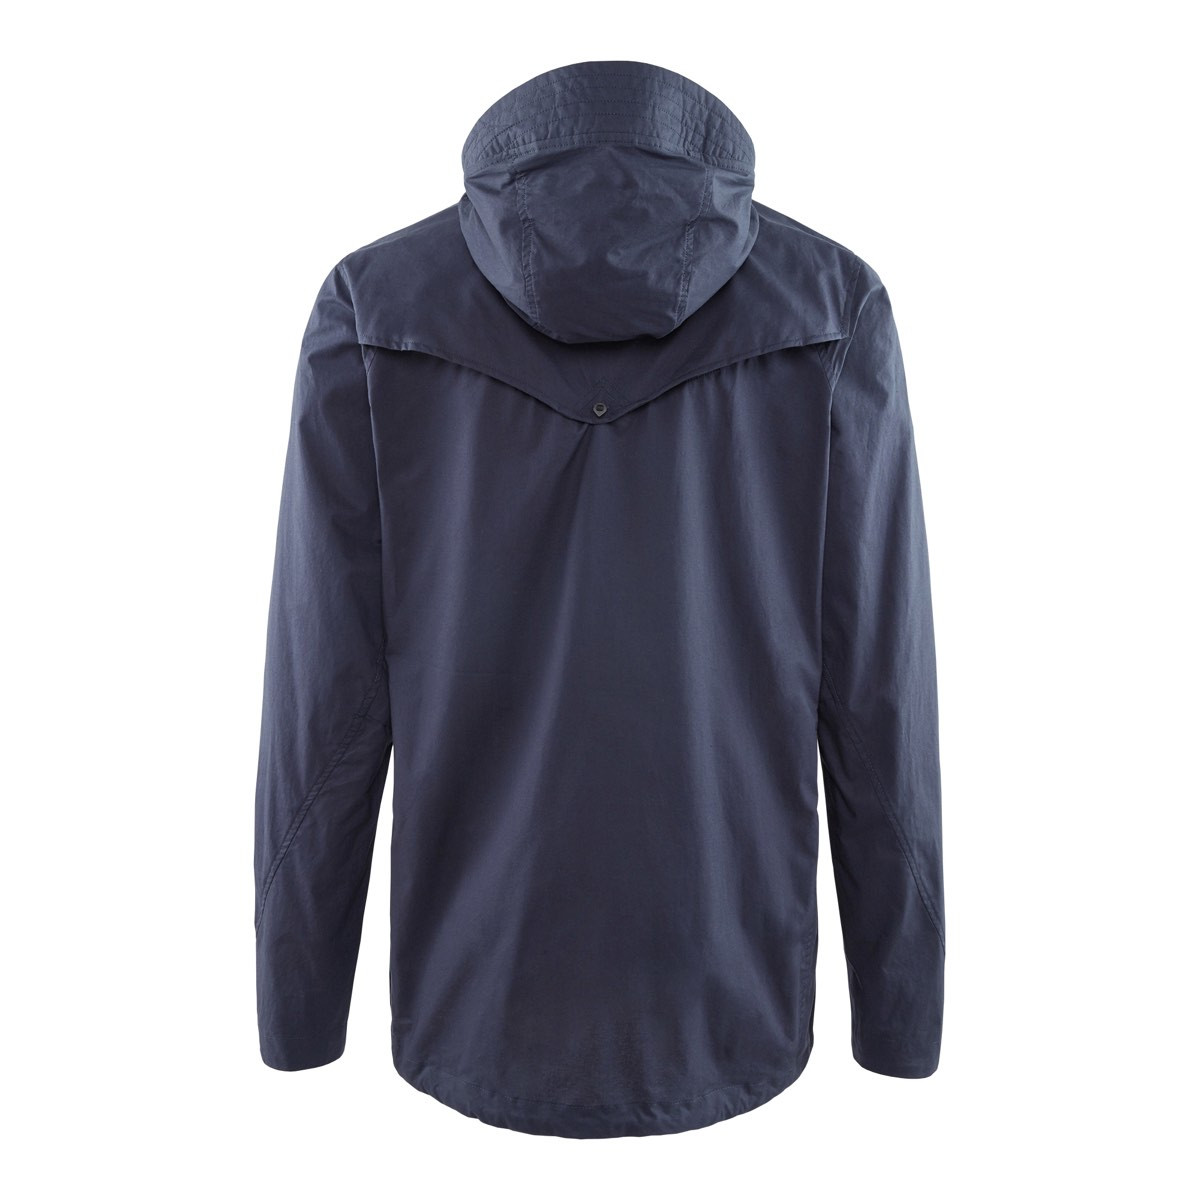 0b9c37b5 ... Klättermusen Loride Jacket Men's Storm Blue ...